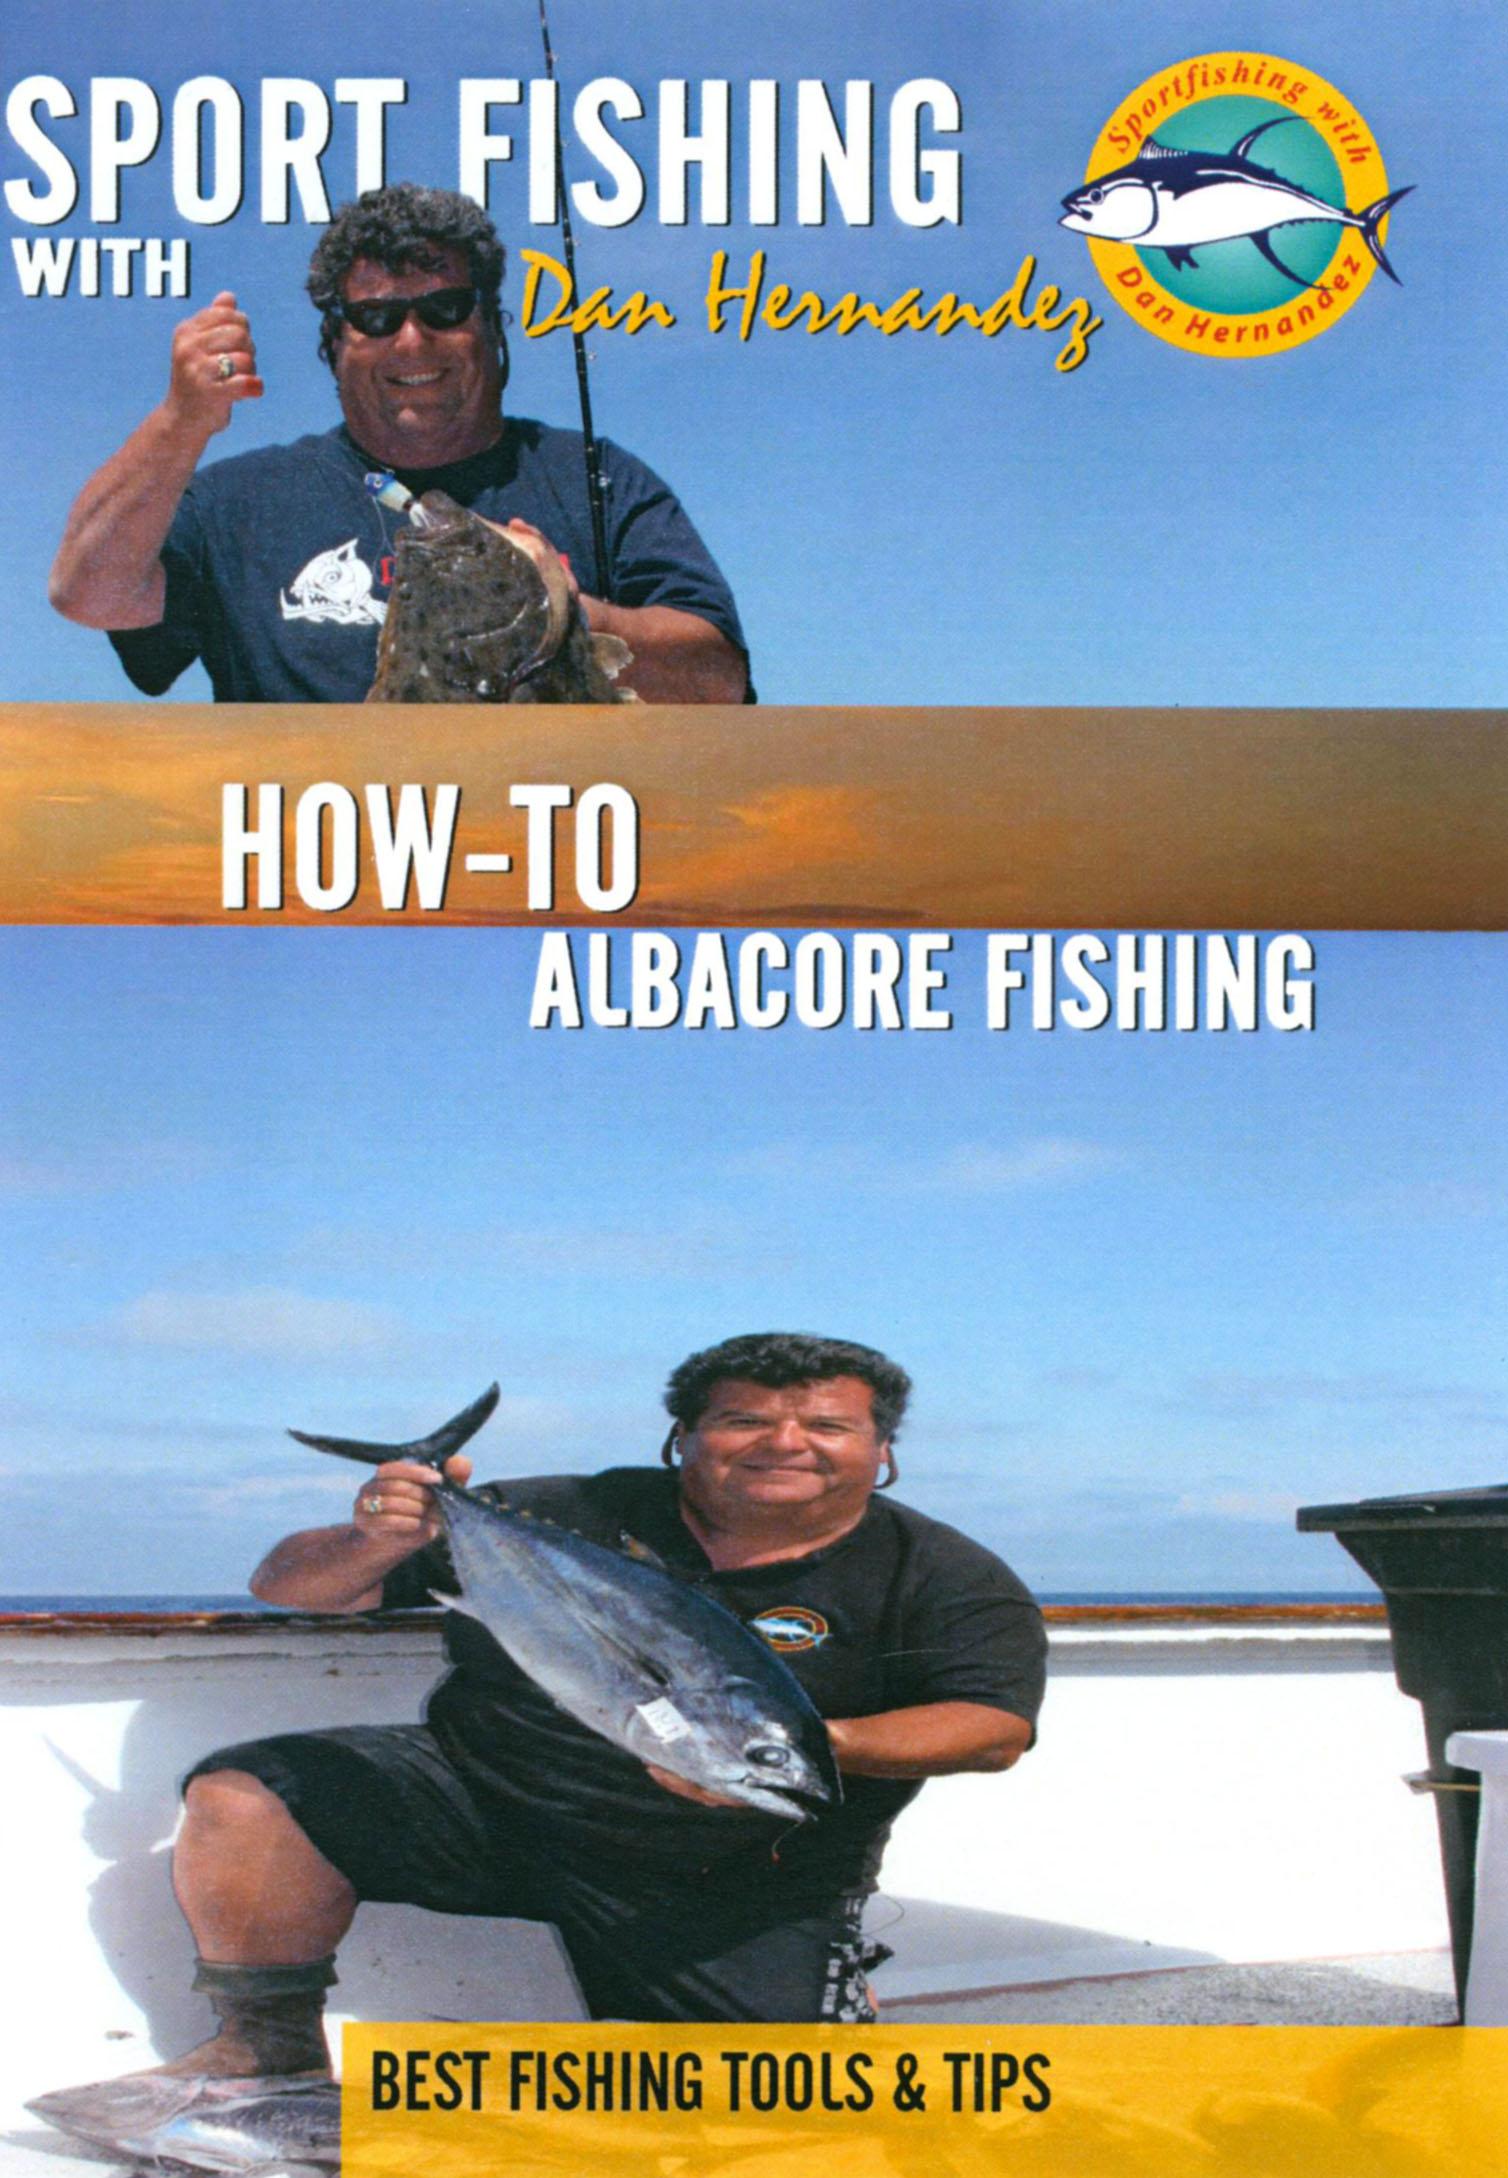 Sport Fishing With Dan Hernandez: How-To Albacore Fishing